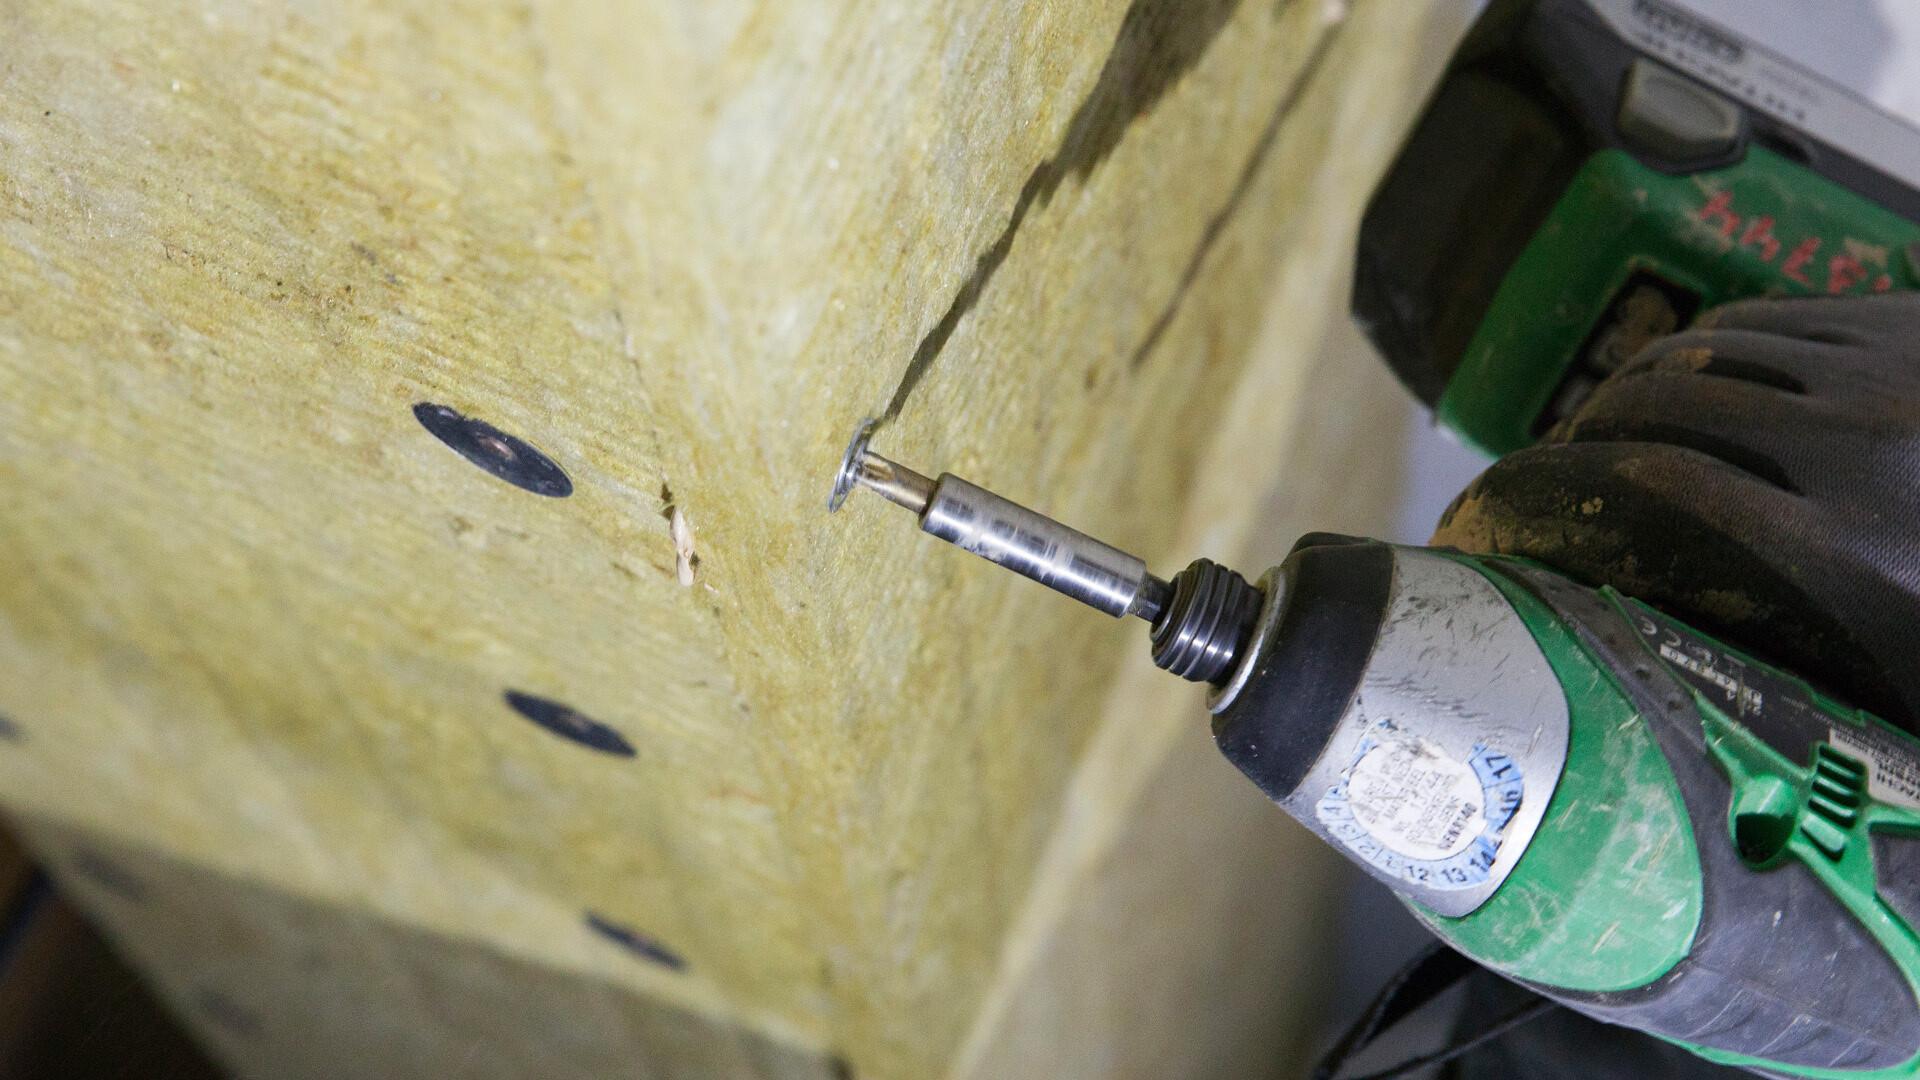 case, thialf, conlit, steelprotect, board